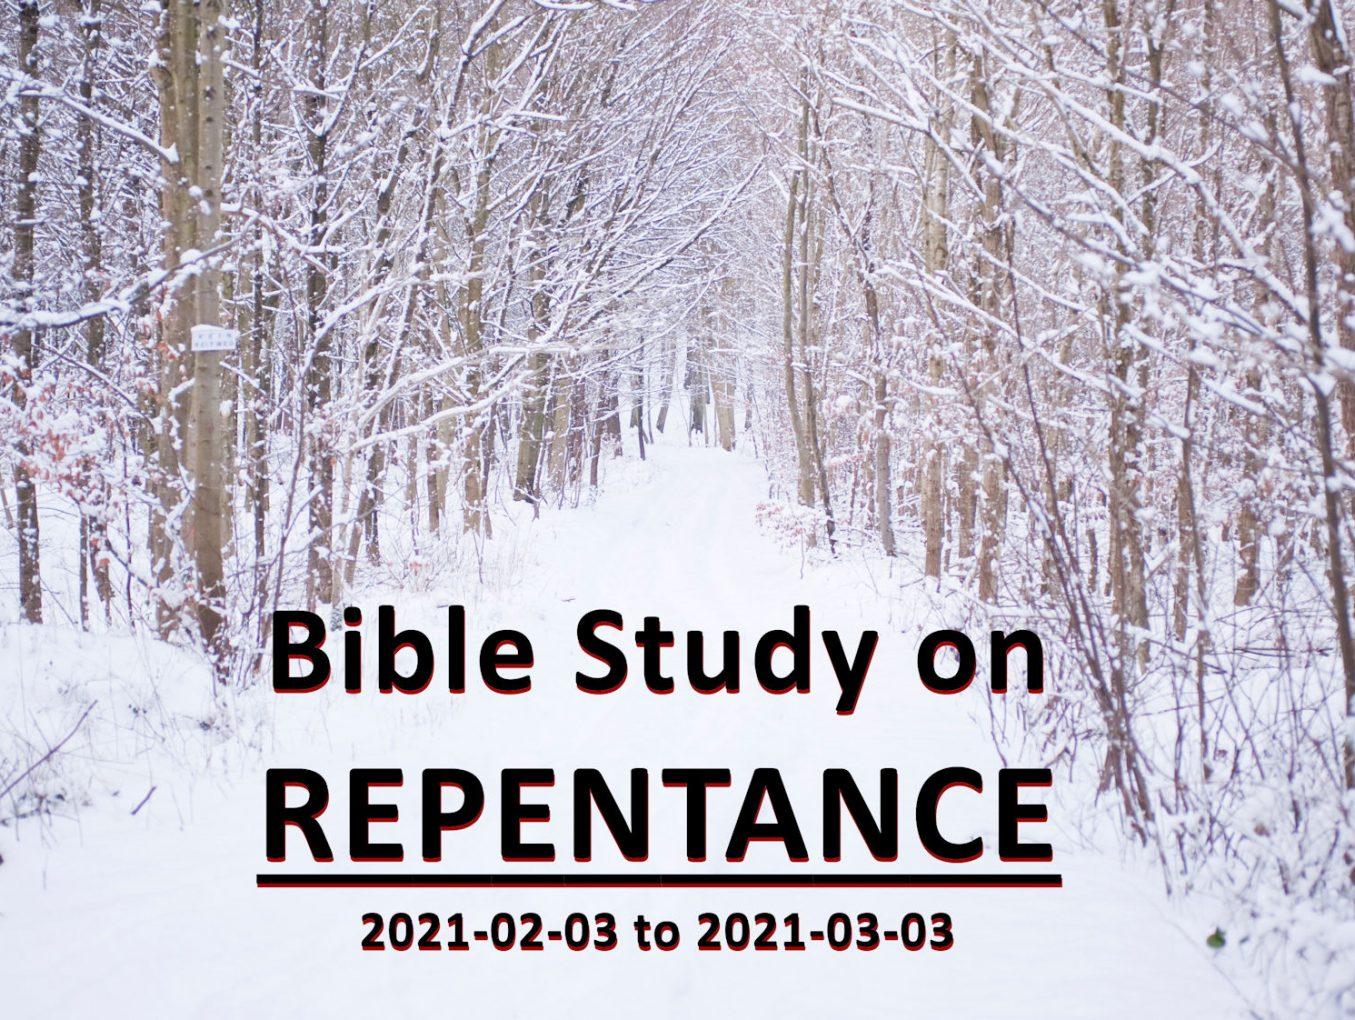 Bible Study on Repentance